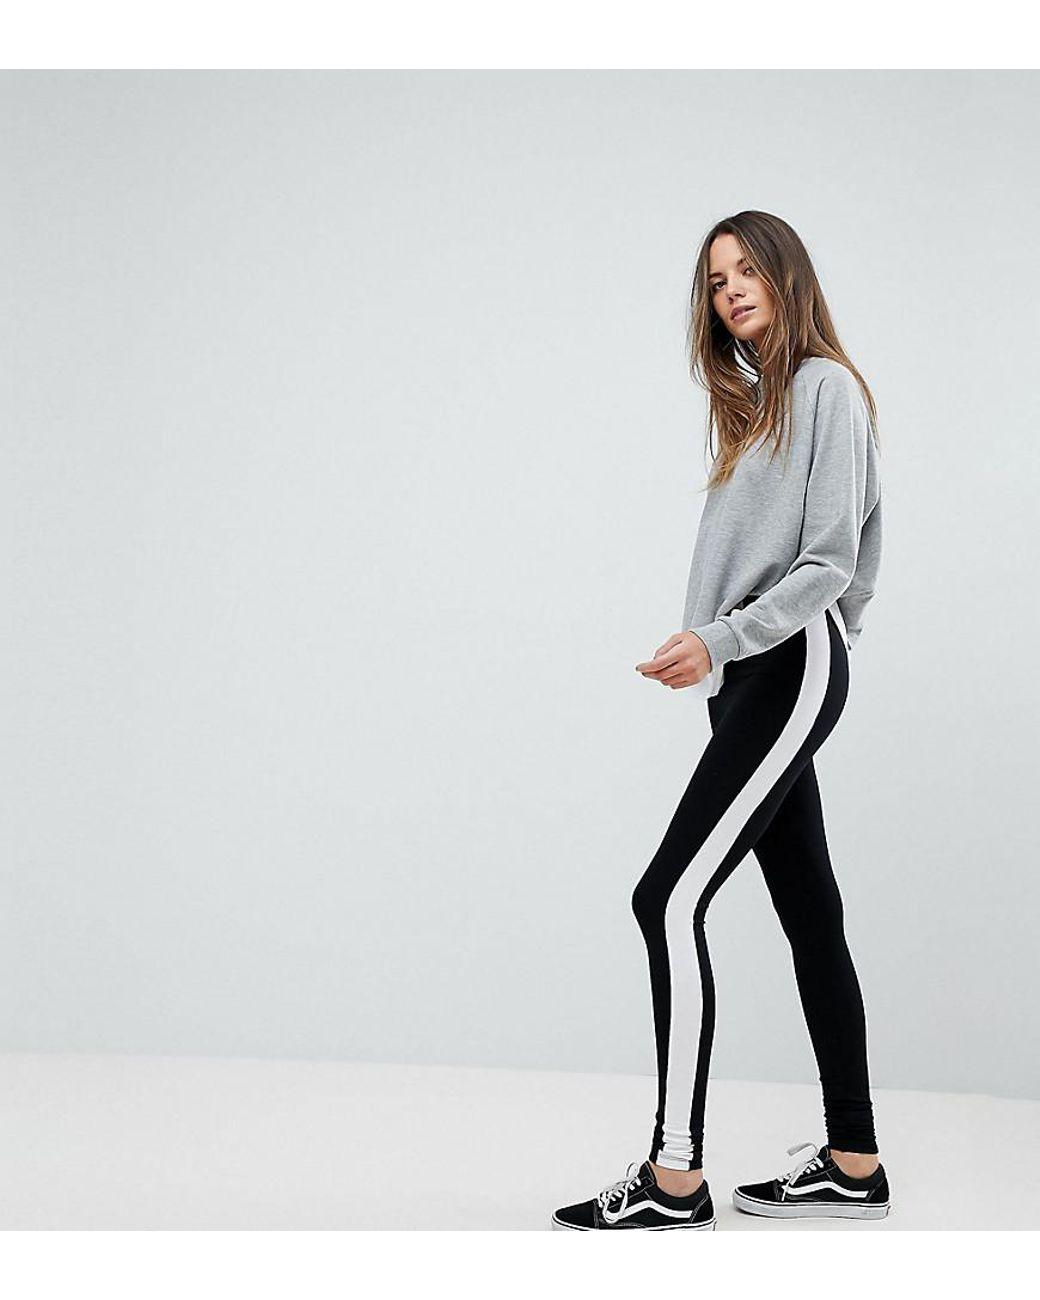 6fec6d0f0b2a8d ASOS Asos Design Tall leggings With Side Stripe in Black - Lyst